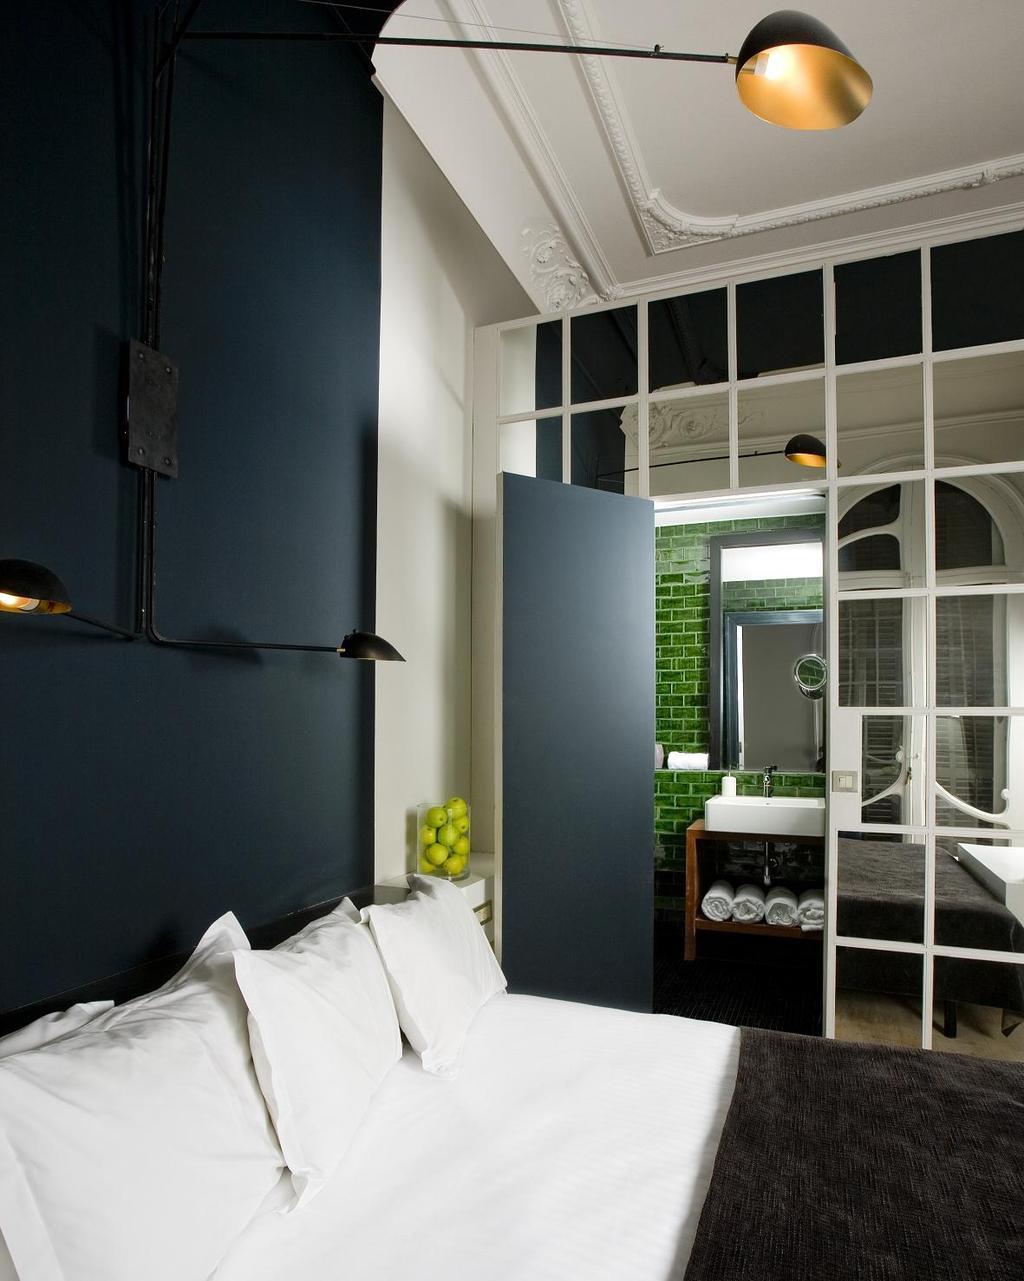 Hotel praktik rambla barcelona spain for Hotel search